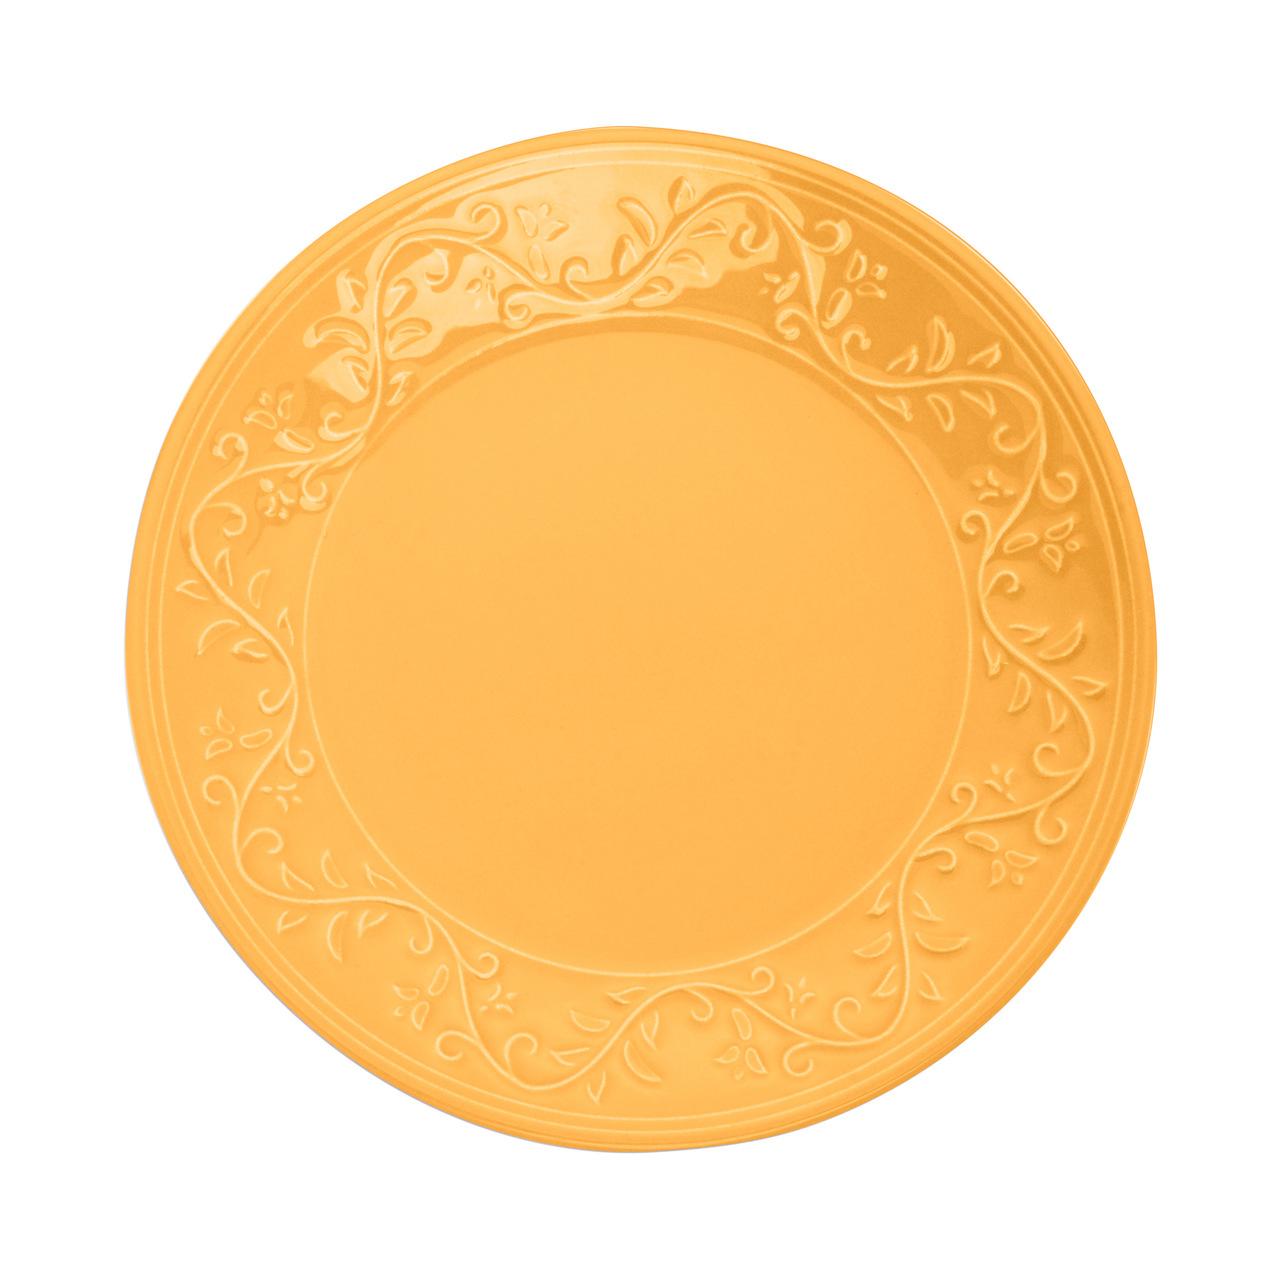 Jogo 6 pratos 26 cm raso de cerâmica Alanya Flame Wolff - 17492